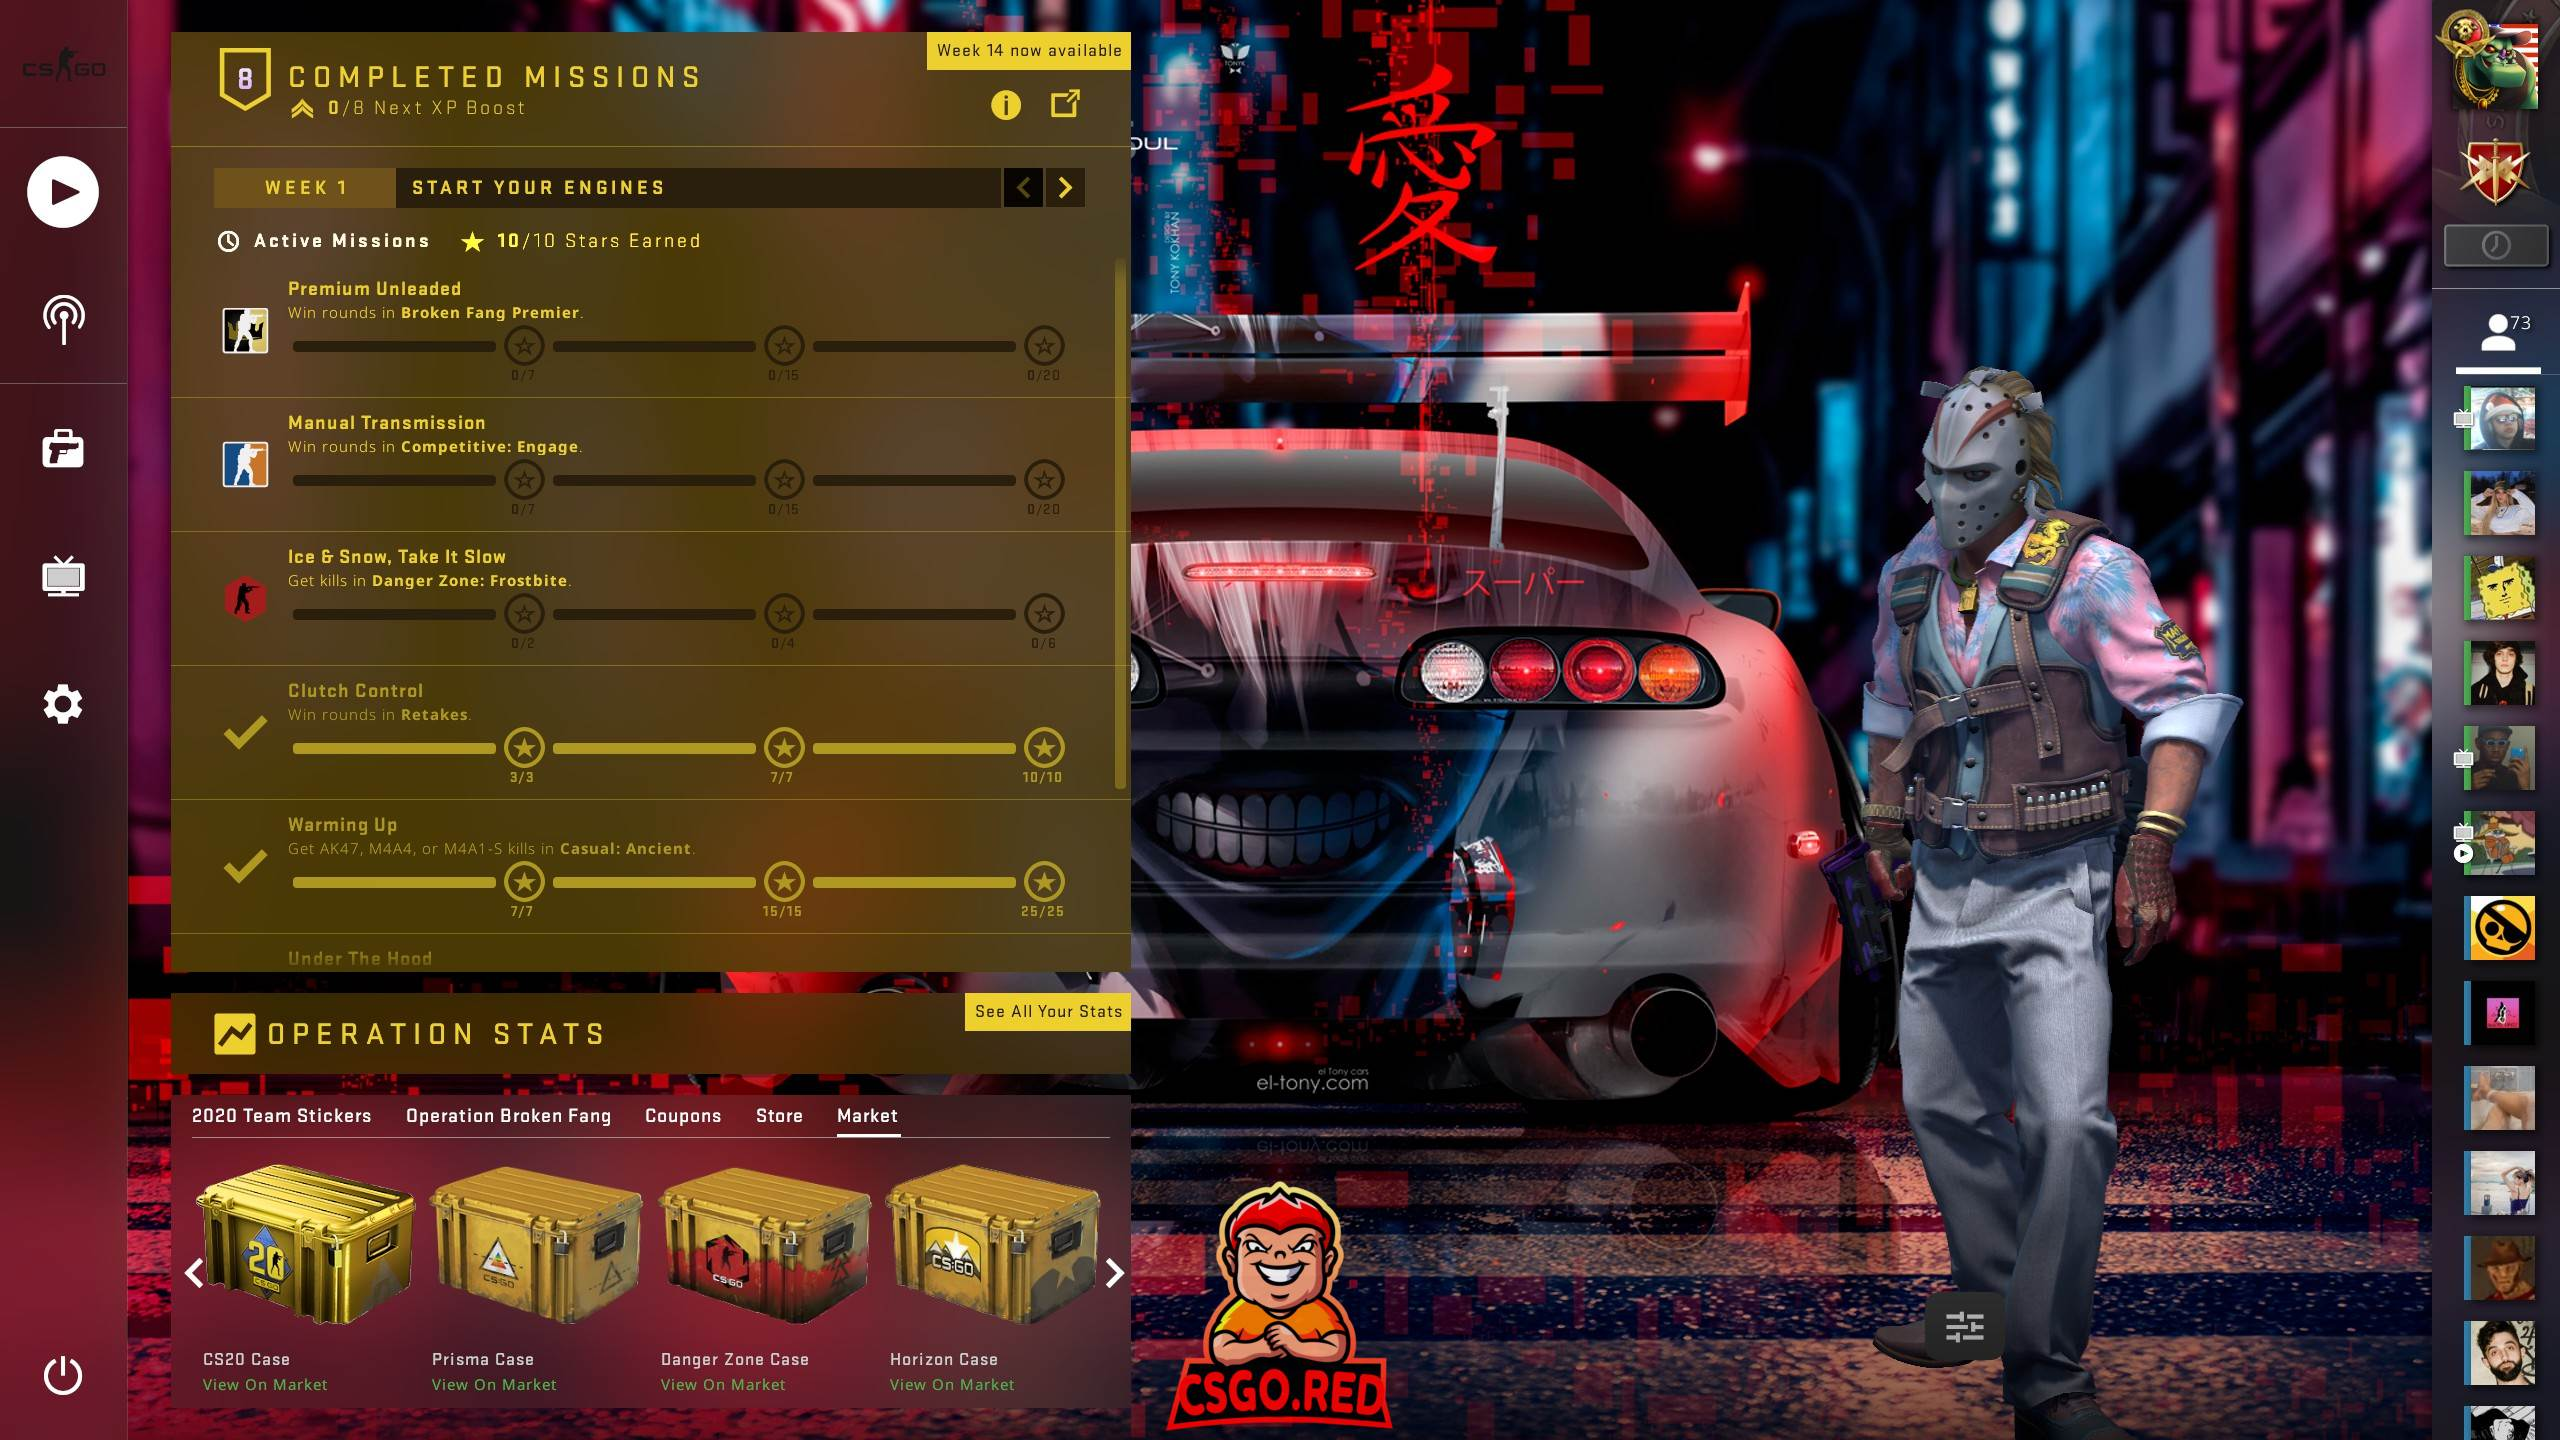 Toyota-Supra CSGO Panorama UI Background Preview